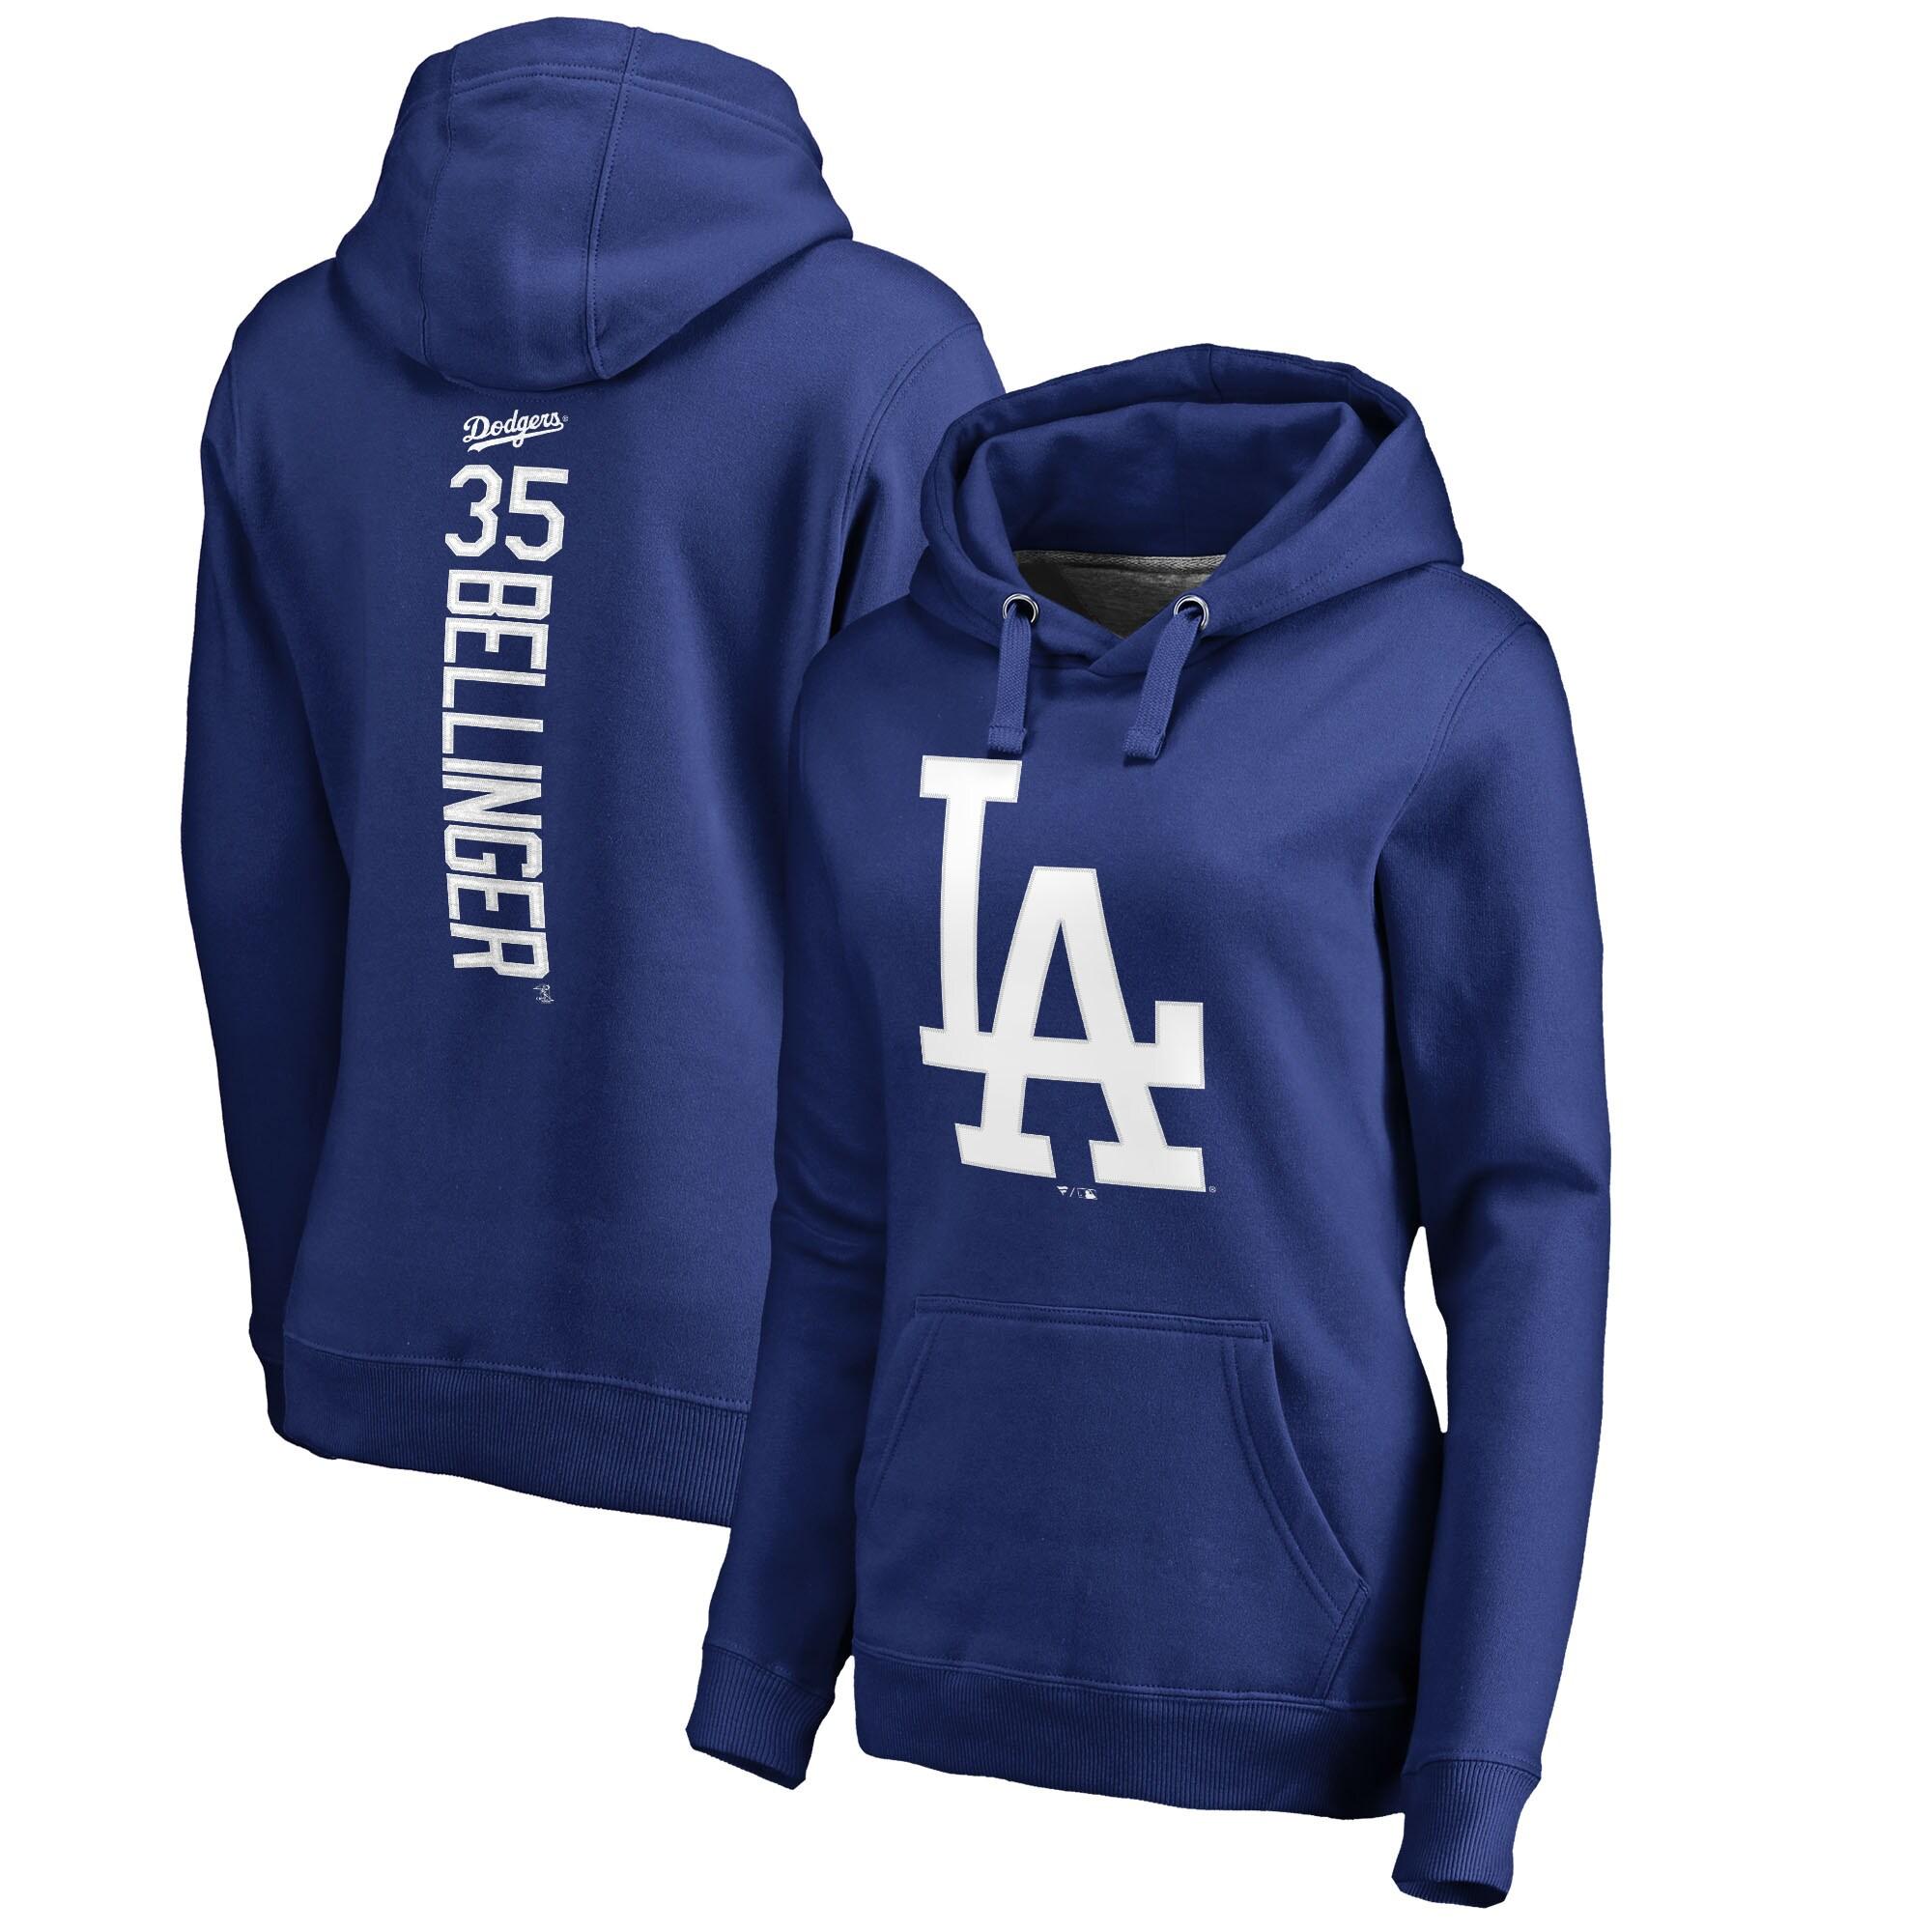 Cody Bellinger Los Angeles Dodgers Fanatics Branded Women's Backer Pullover Hoodie - Royal